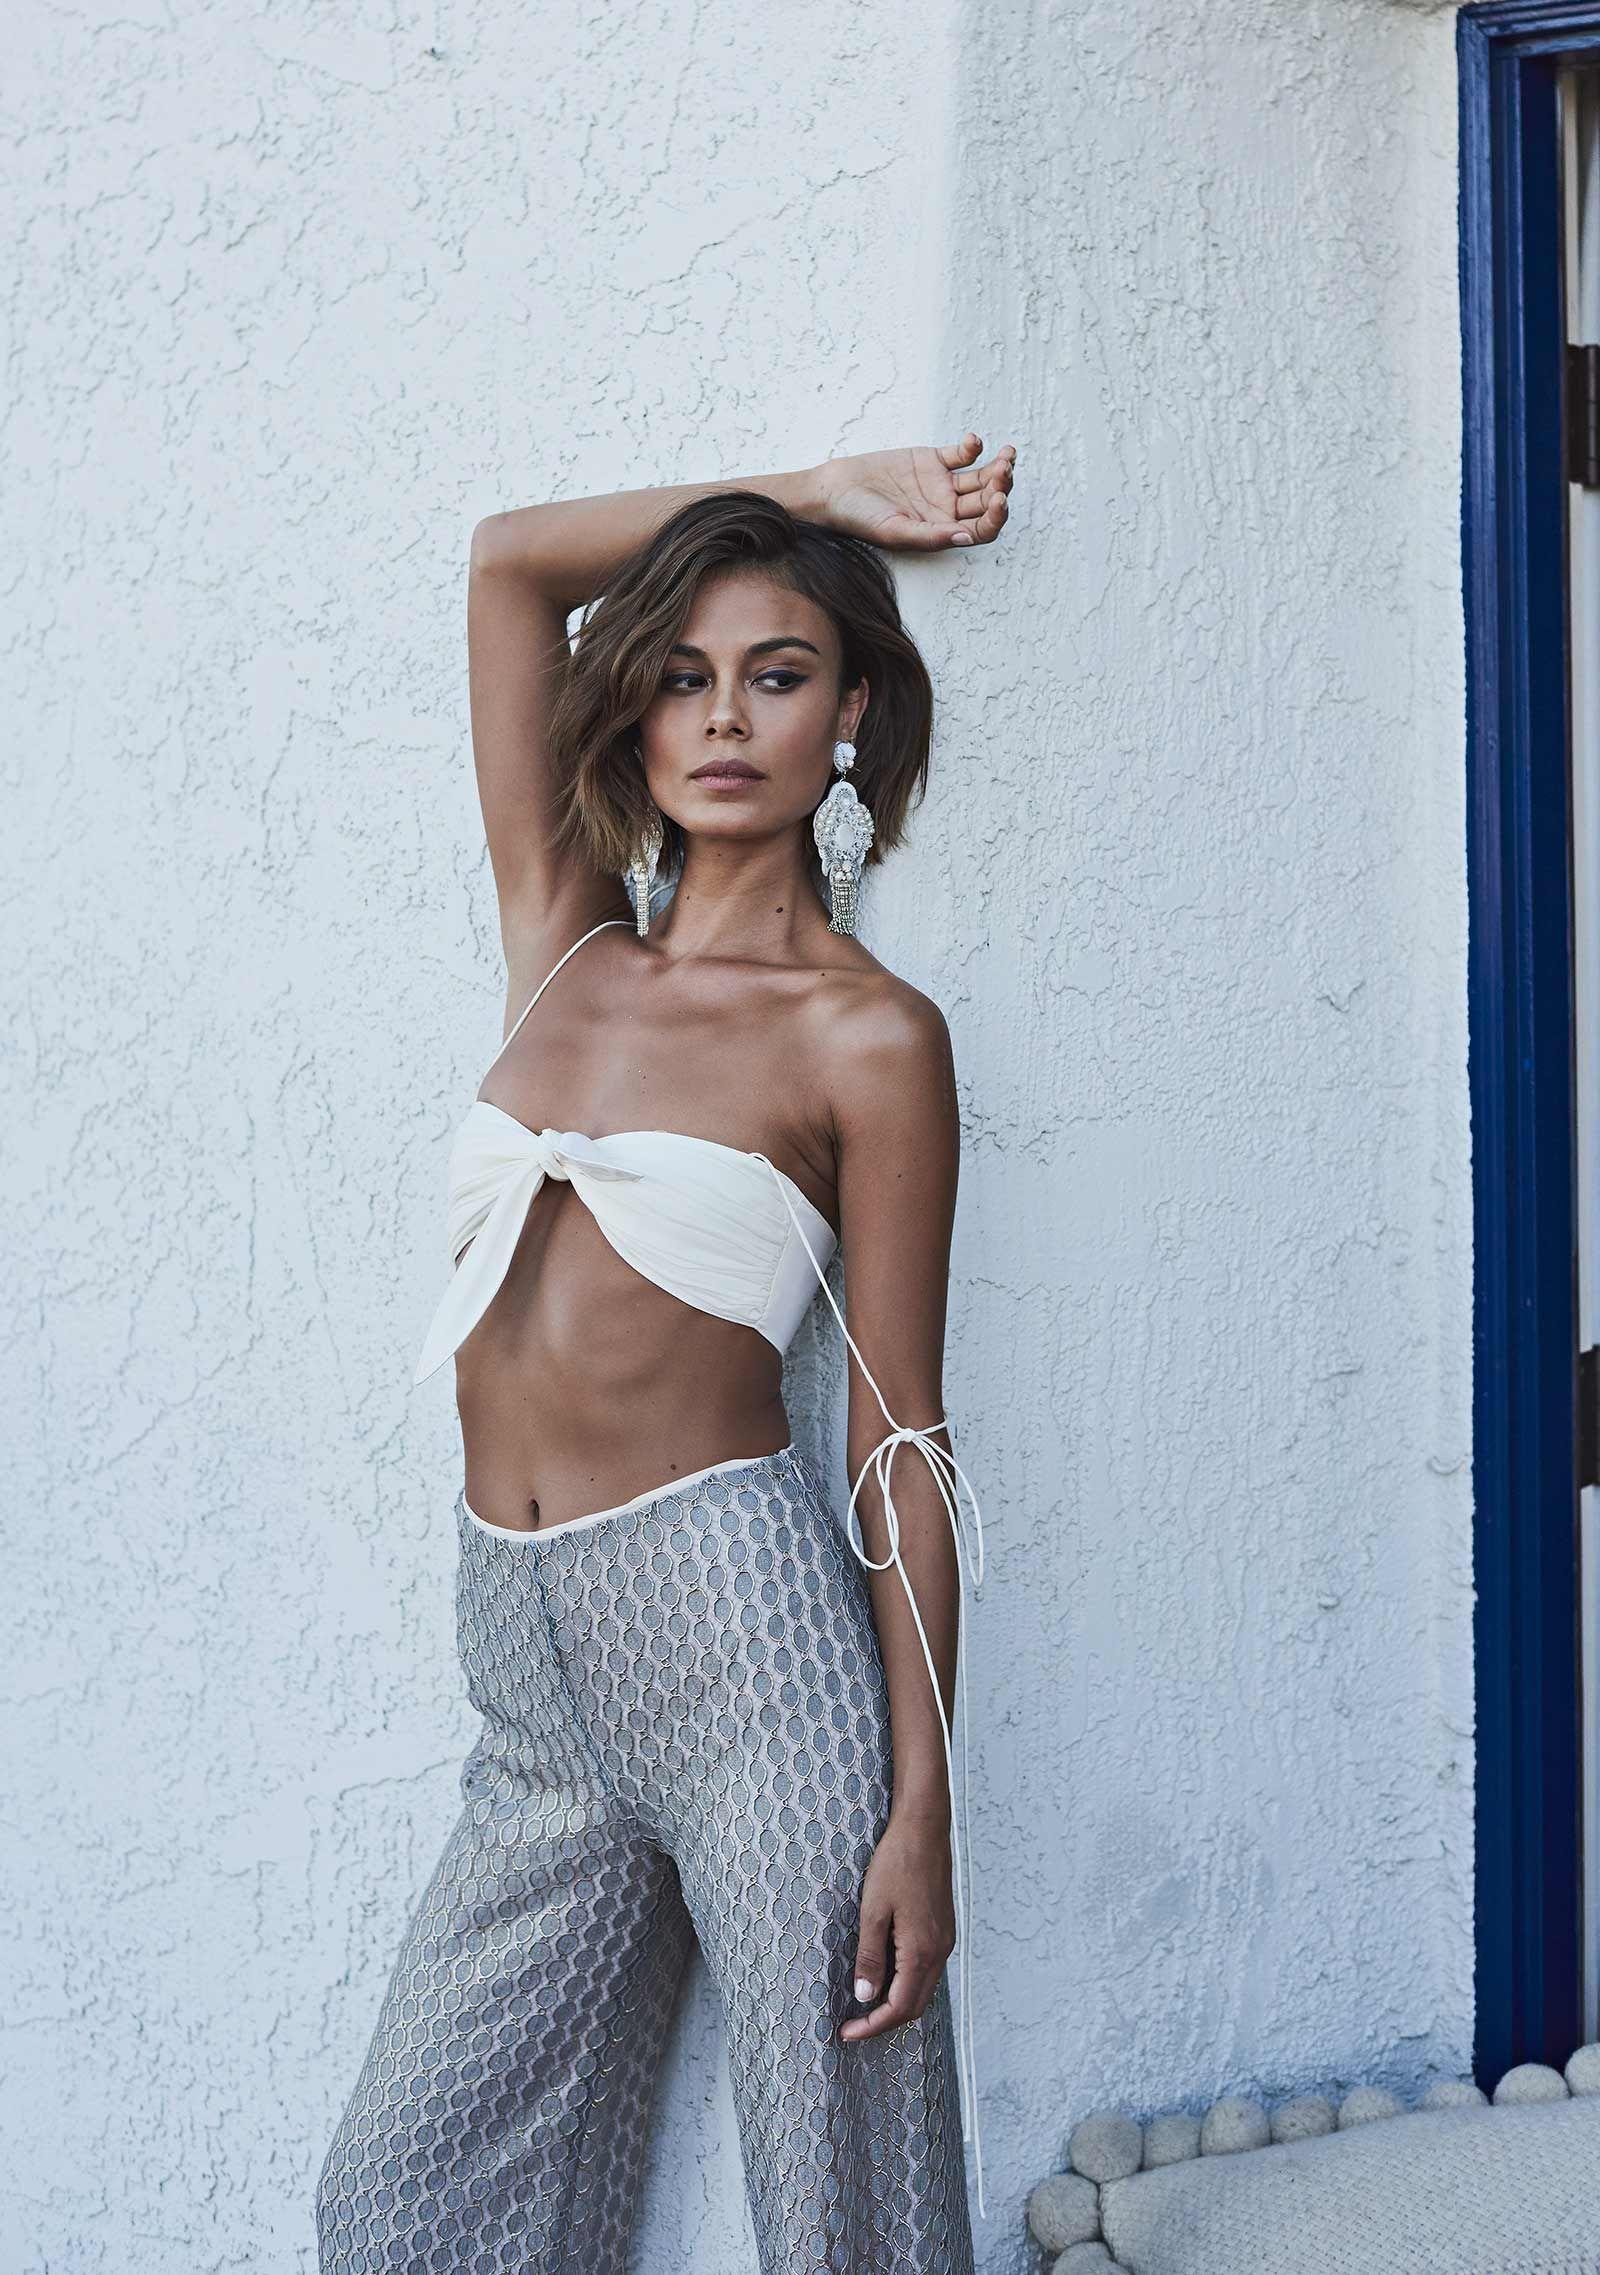 Leaked Alicia Silverstone nude photos 2019